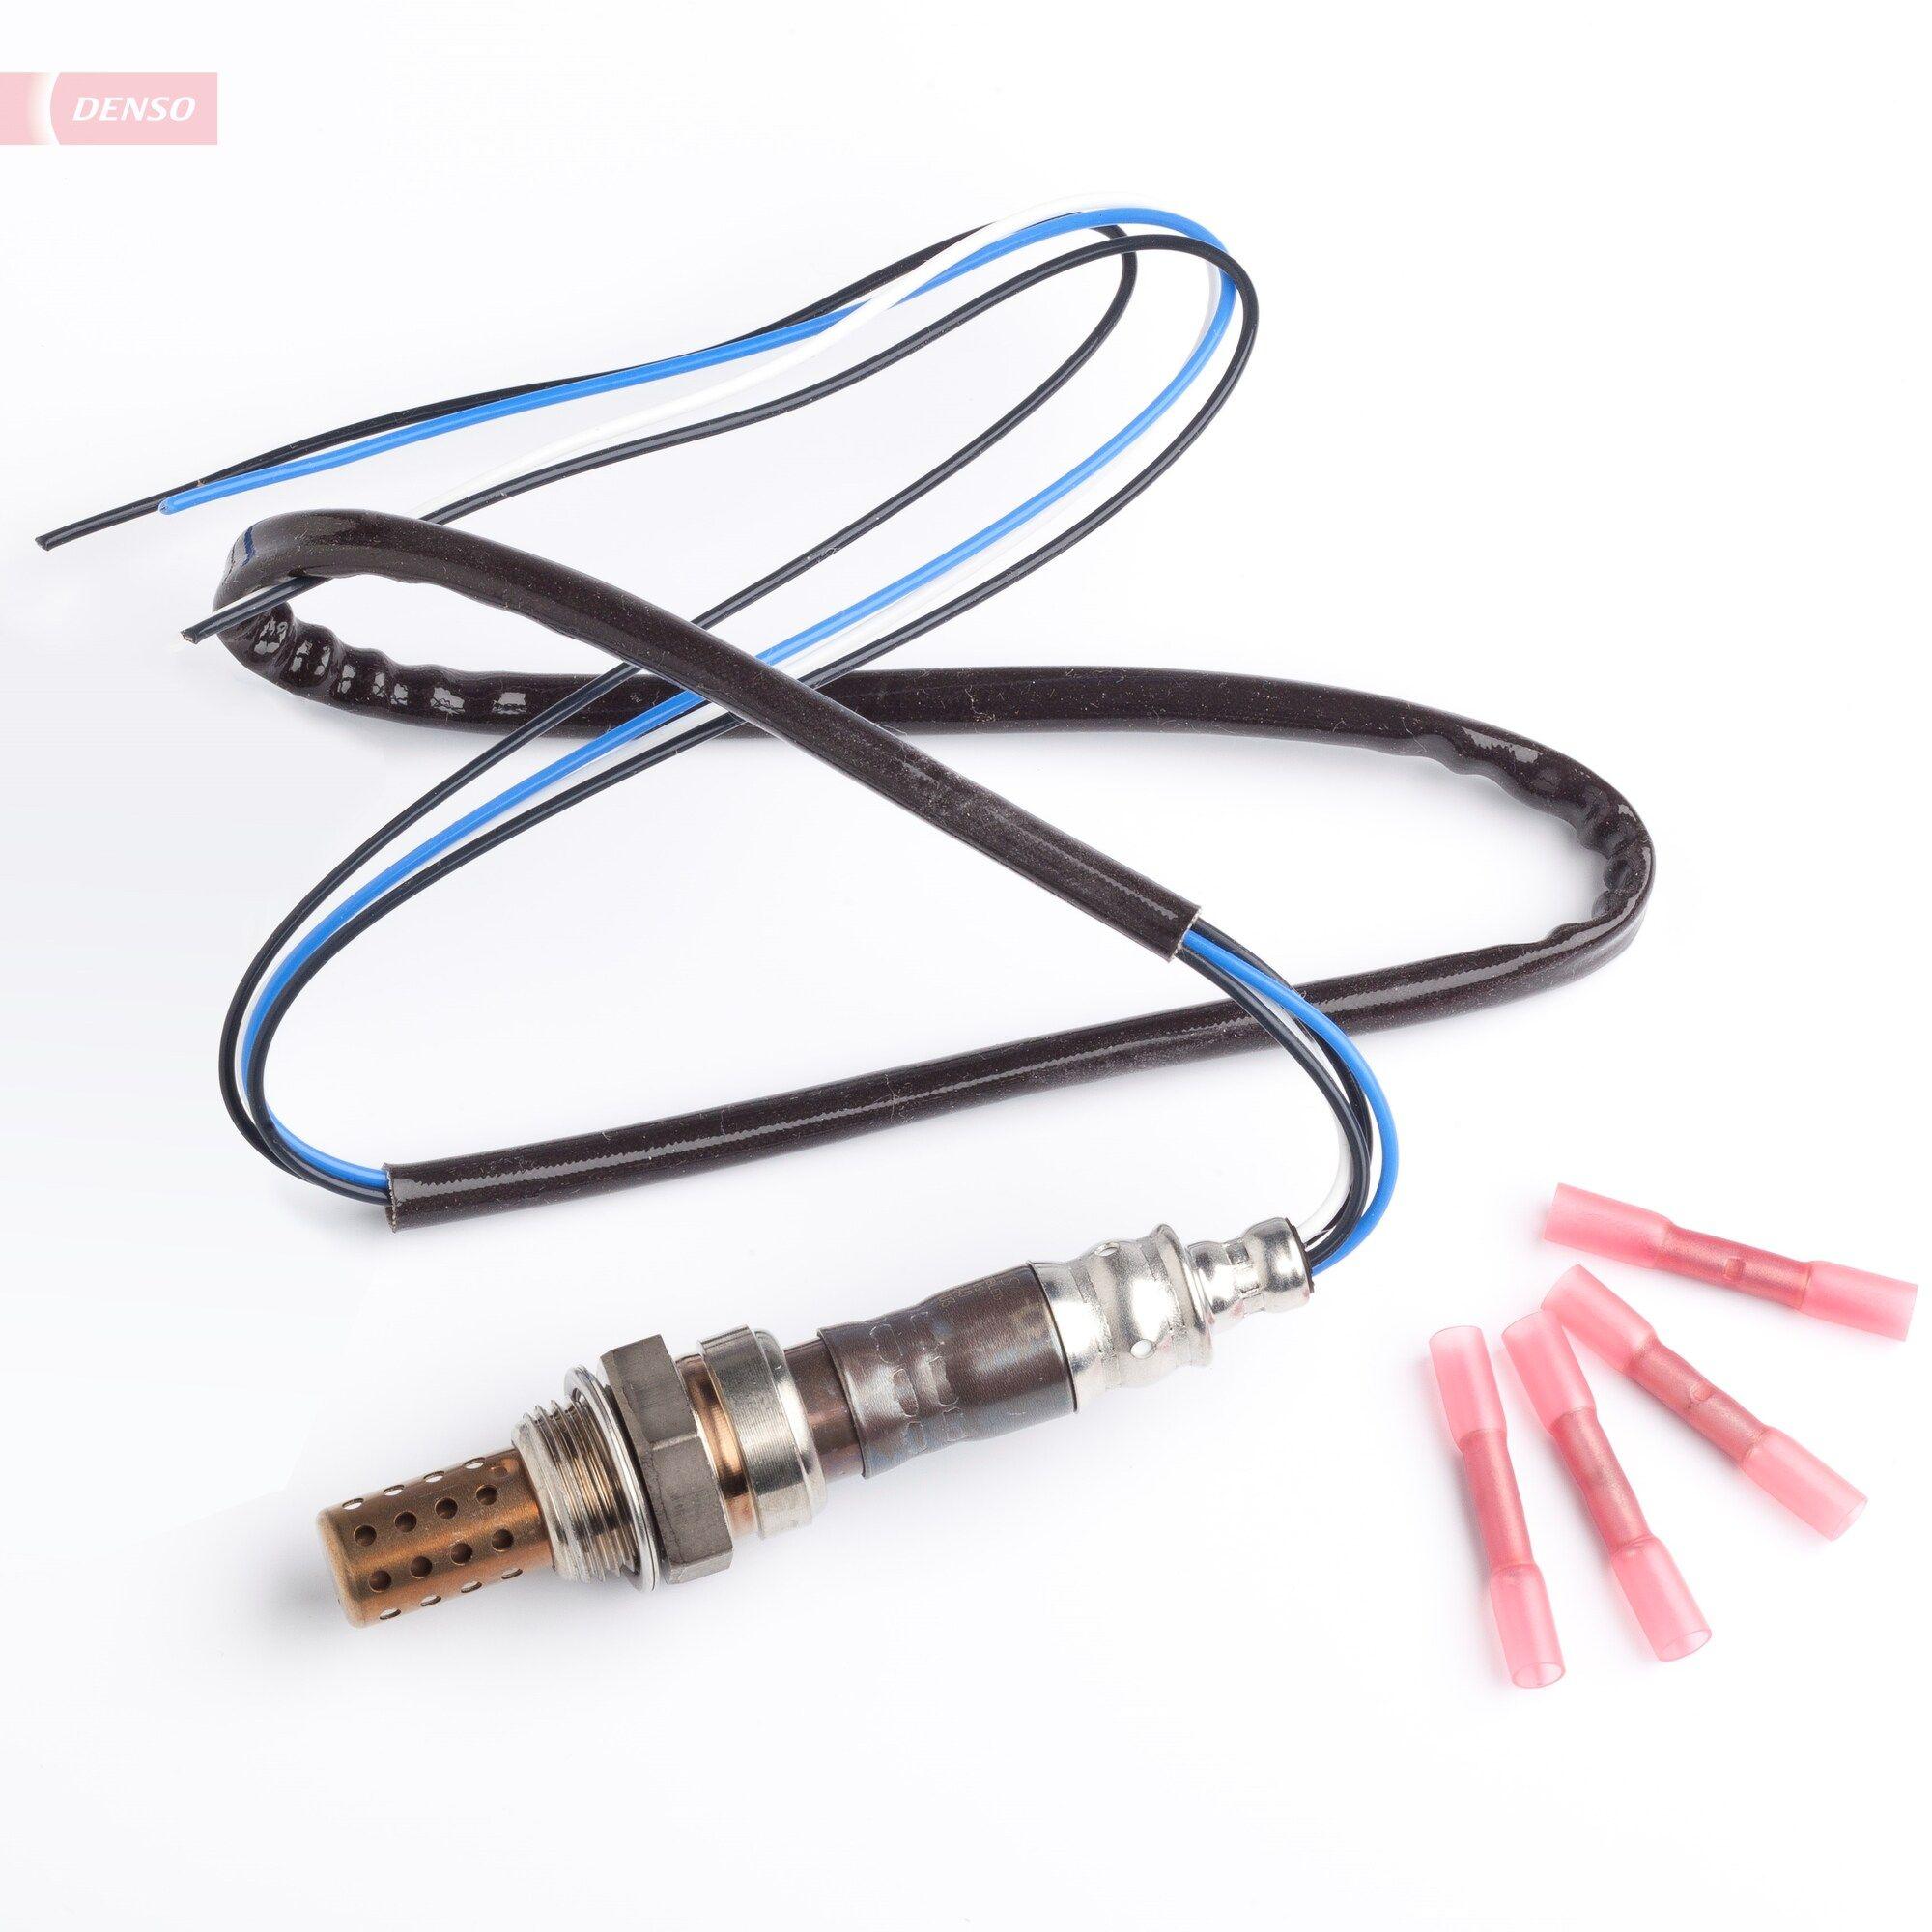 DOX-0109 DENSO valmistajalta asti - 25% alennus!